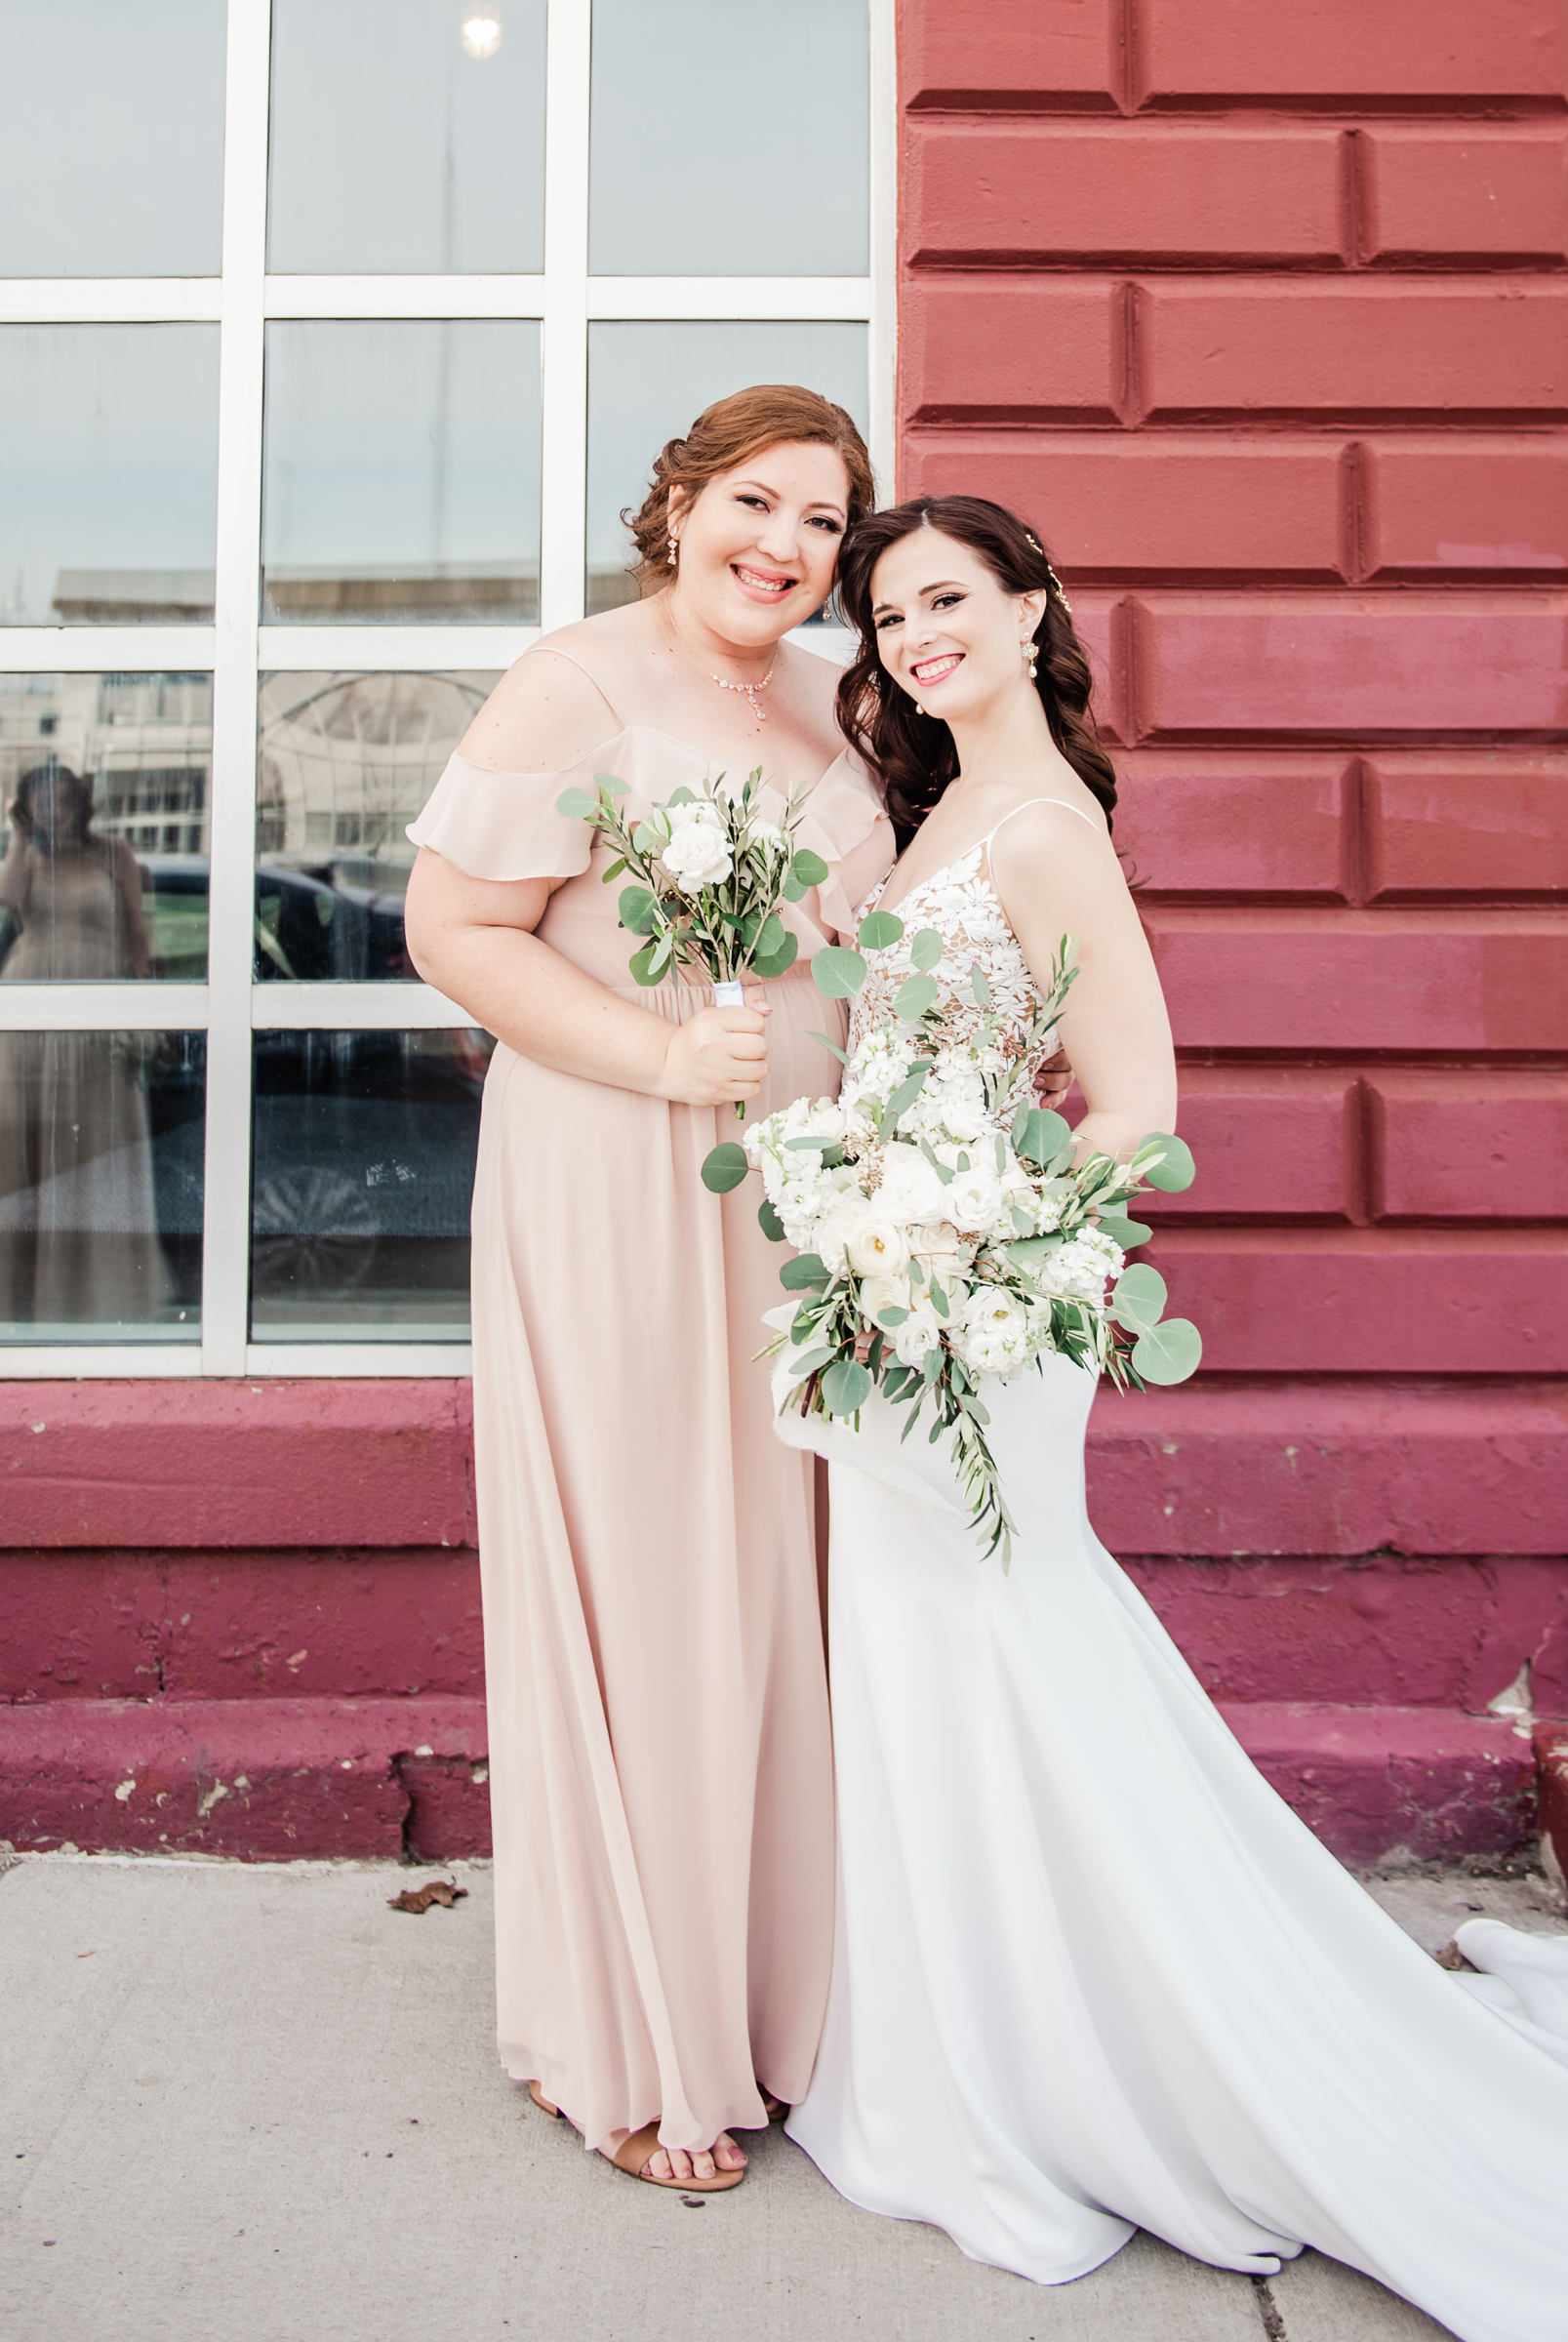 The_Arbor_LoftRochester_Wedding_JILL_STUDIO_Rochester_NY_Photographer_153124.jpg